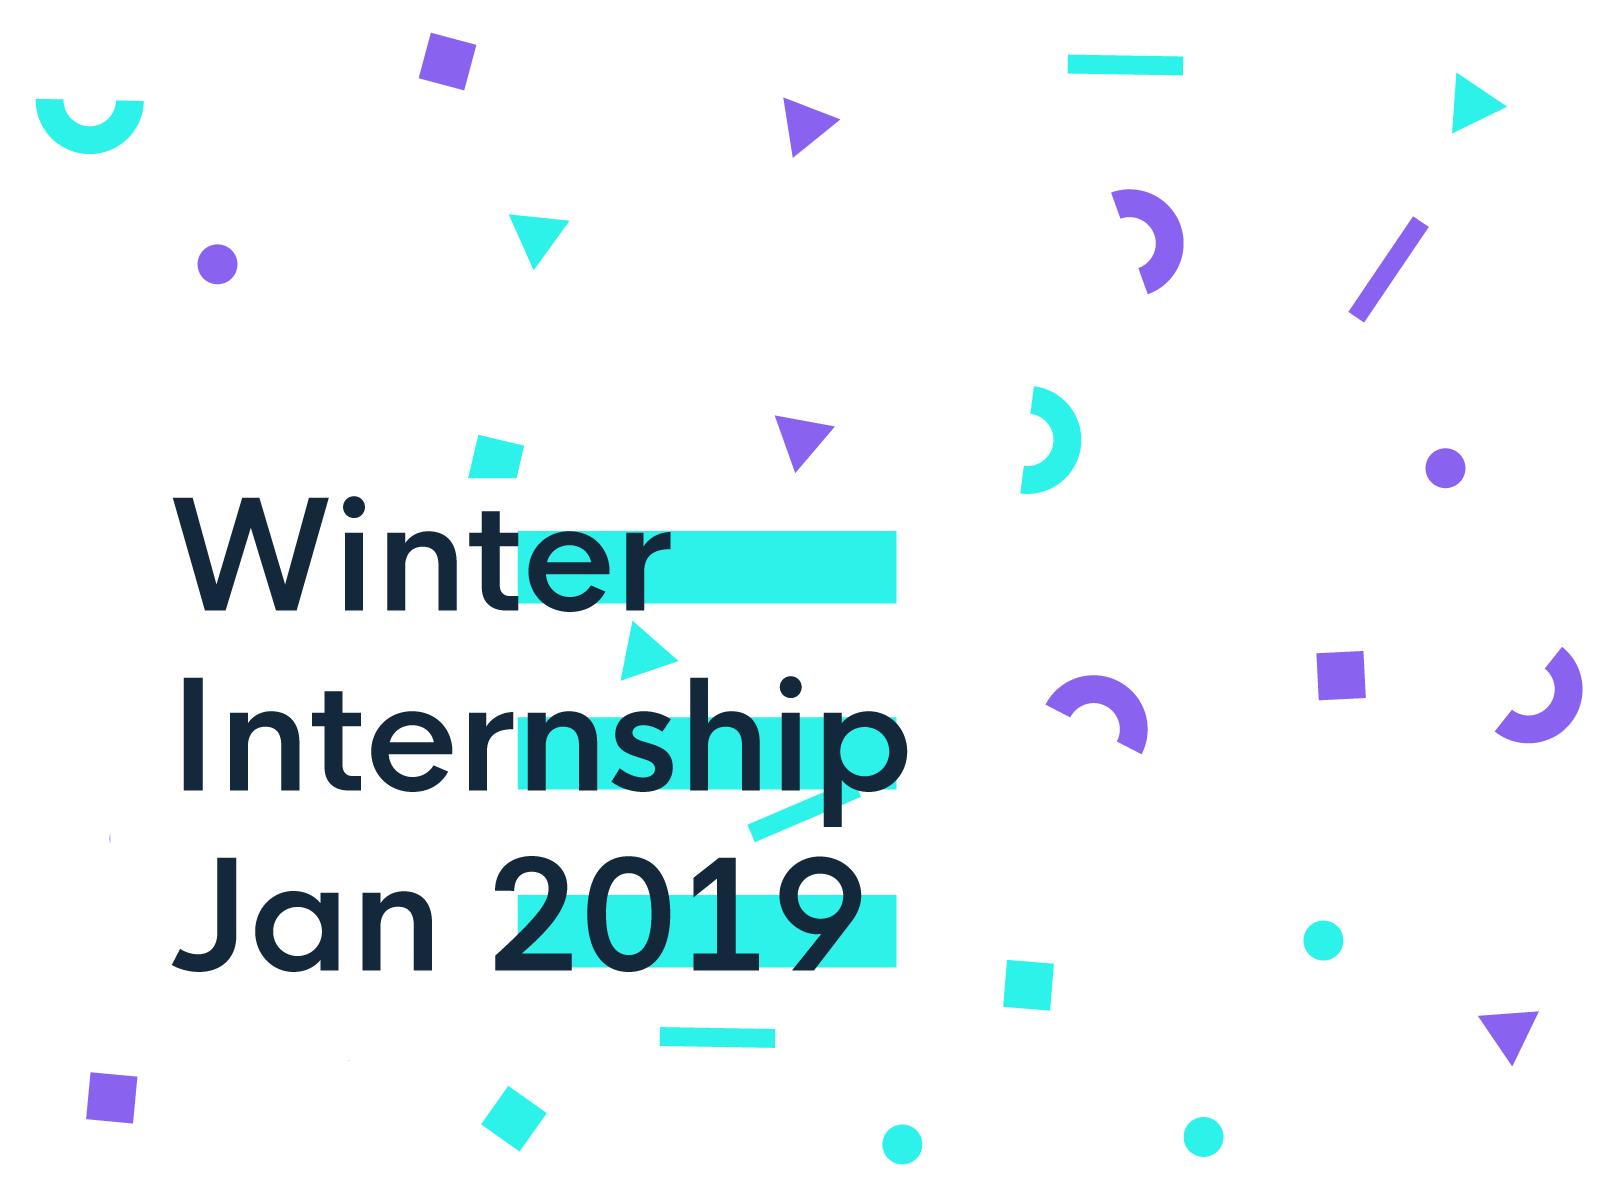 Winter internship